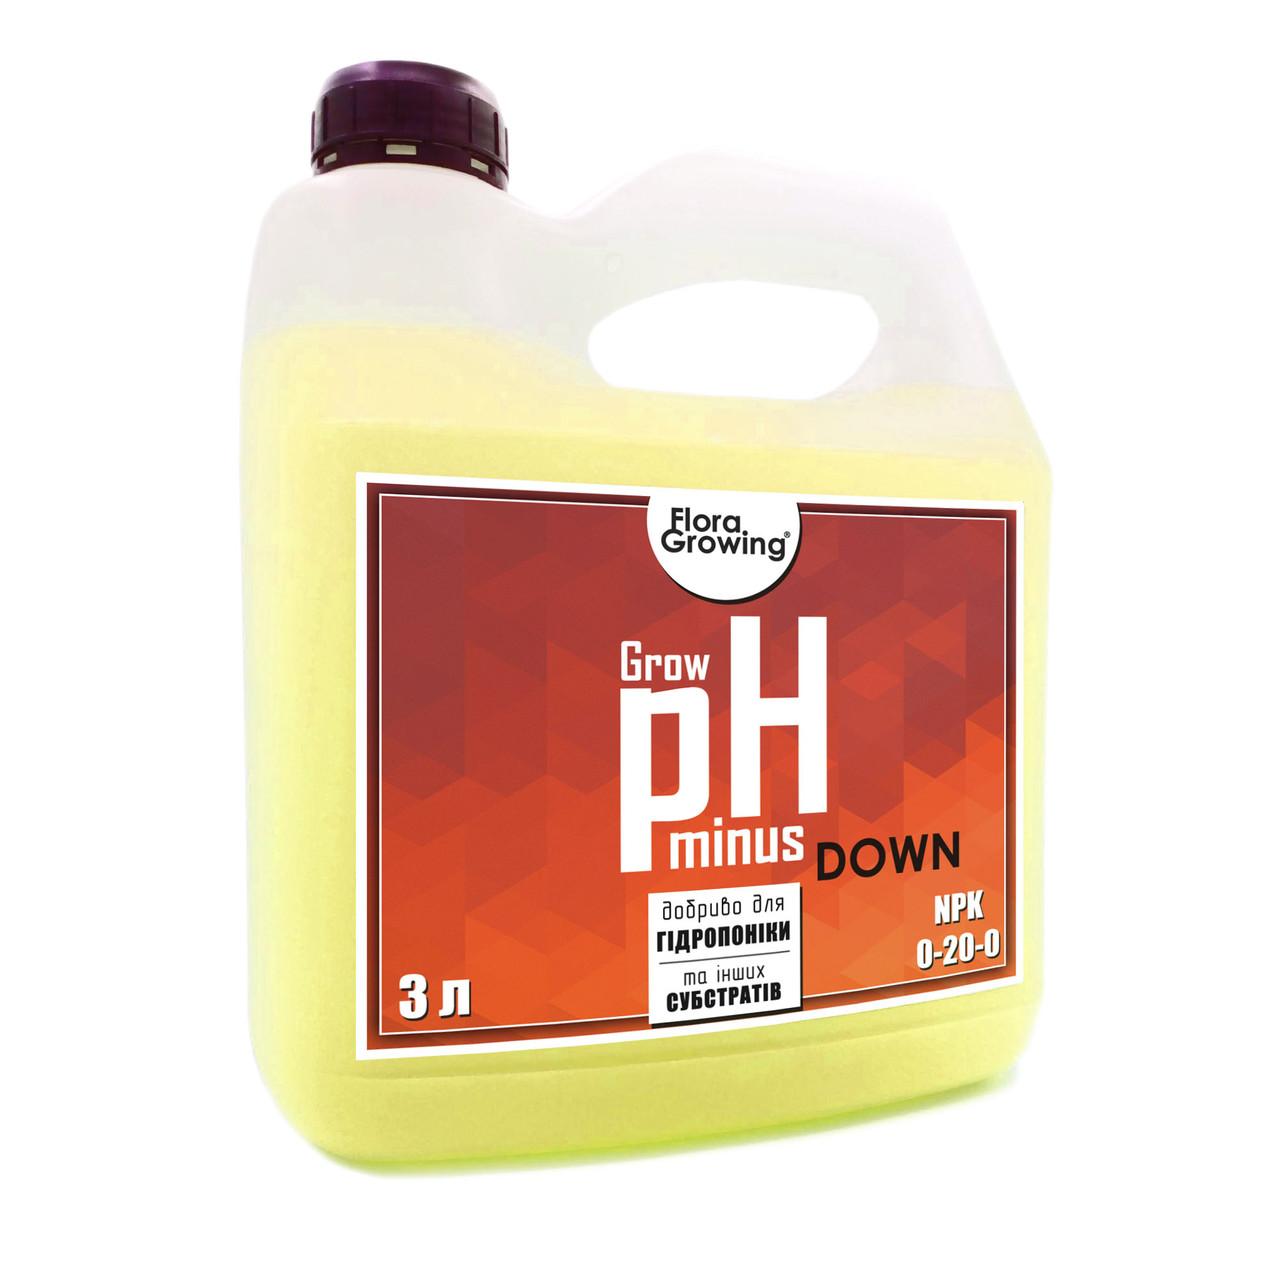 3 л Корректор pH Down/minus  Grow